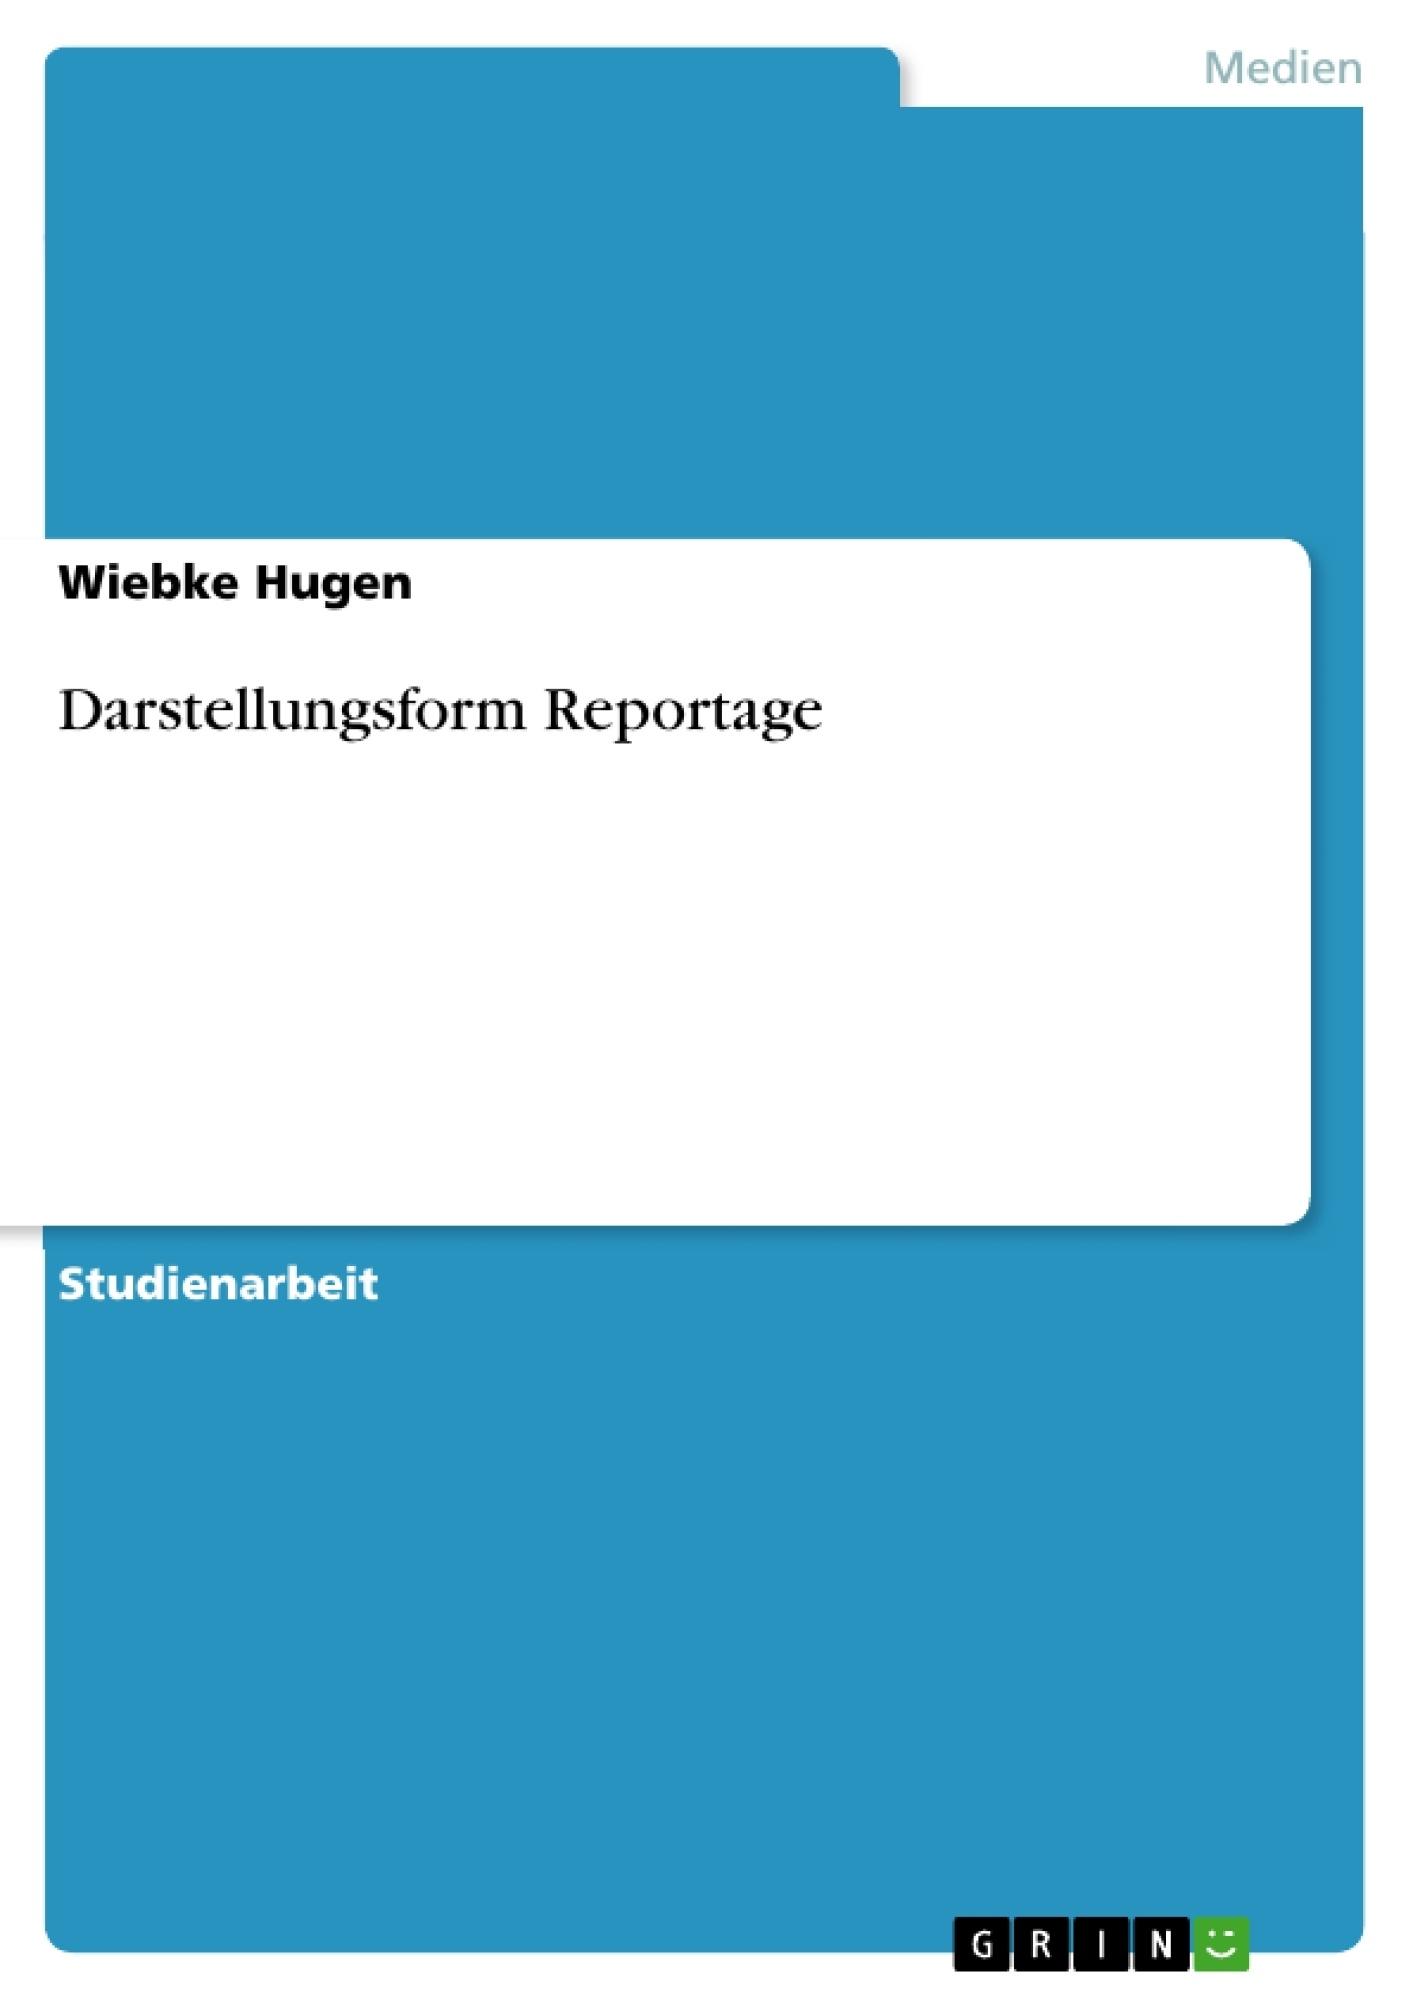 Titel: Darstellungsform Reportage